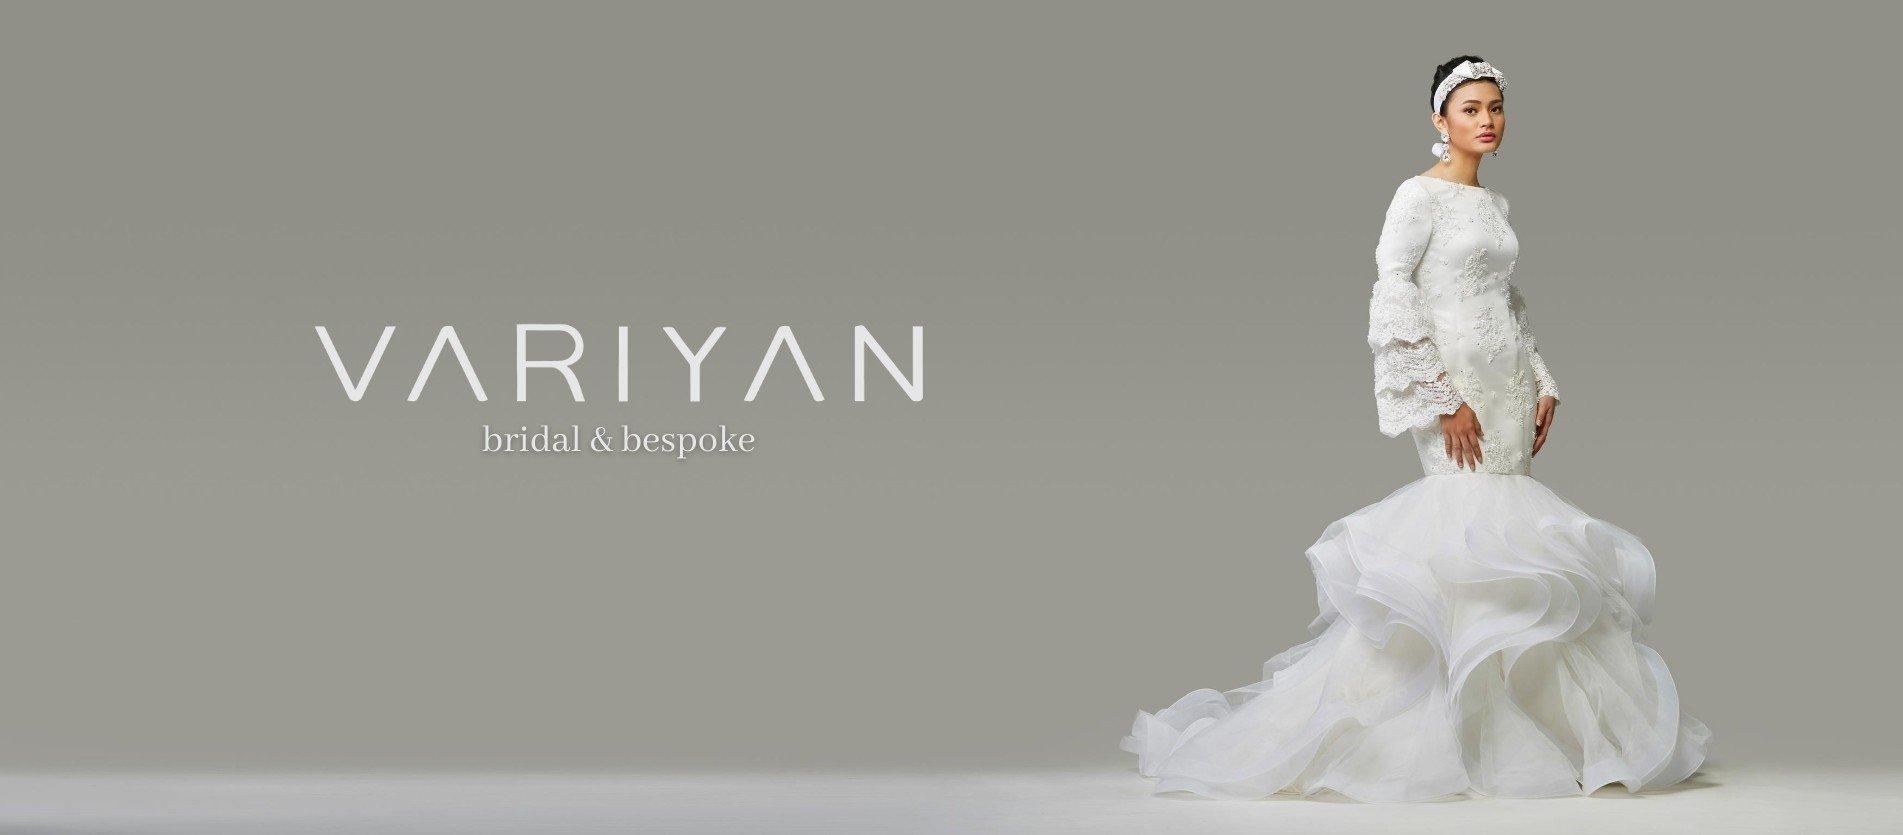 Bridal bespoke banner